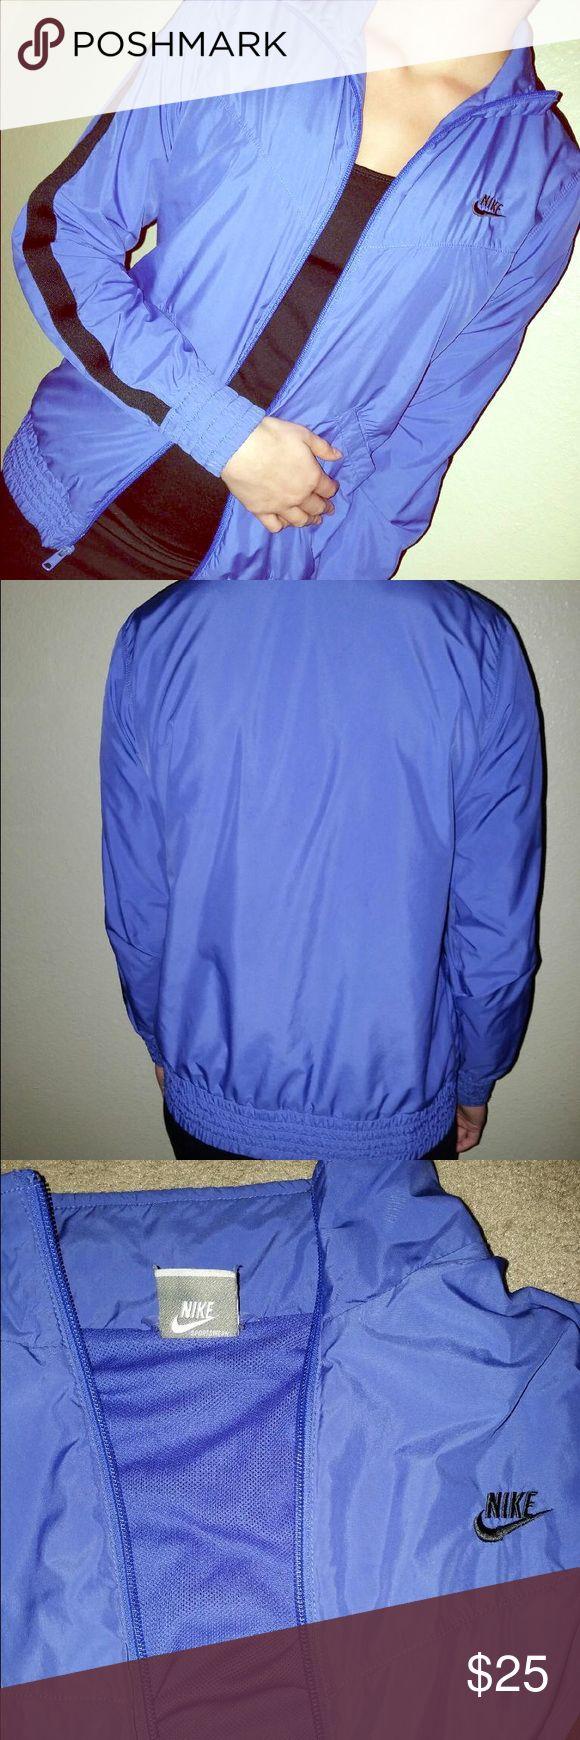 purple nike dri fit jacket purple waterproof long sleeve jacket thin nike Nike Jackets & Coats